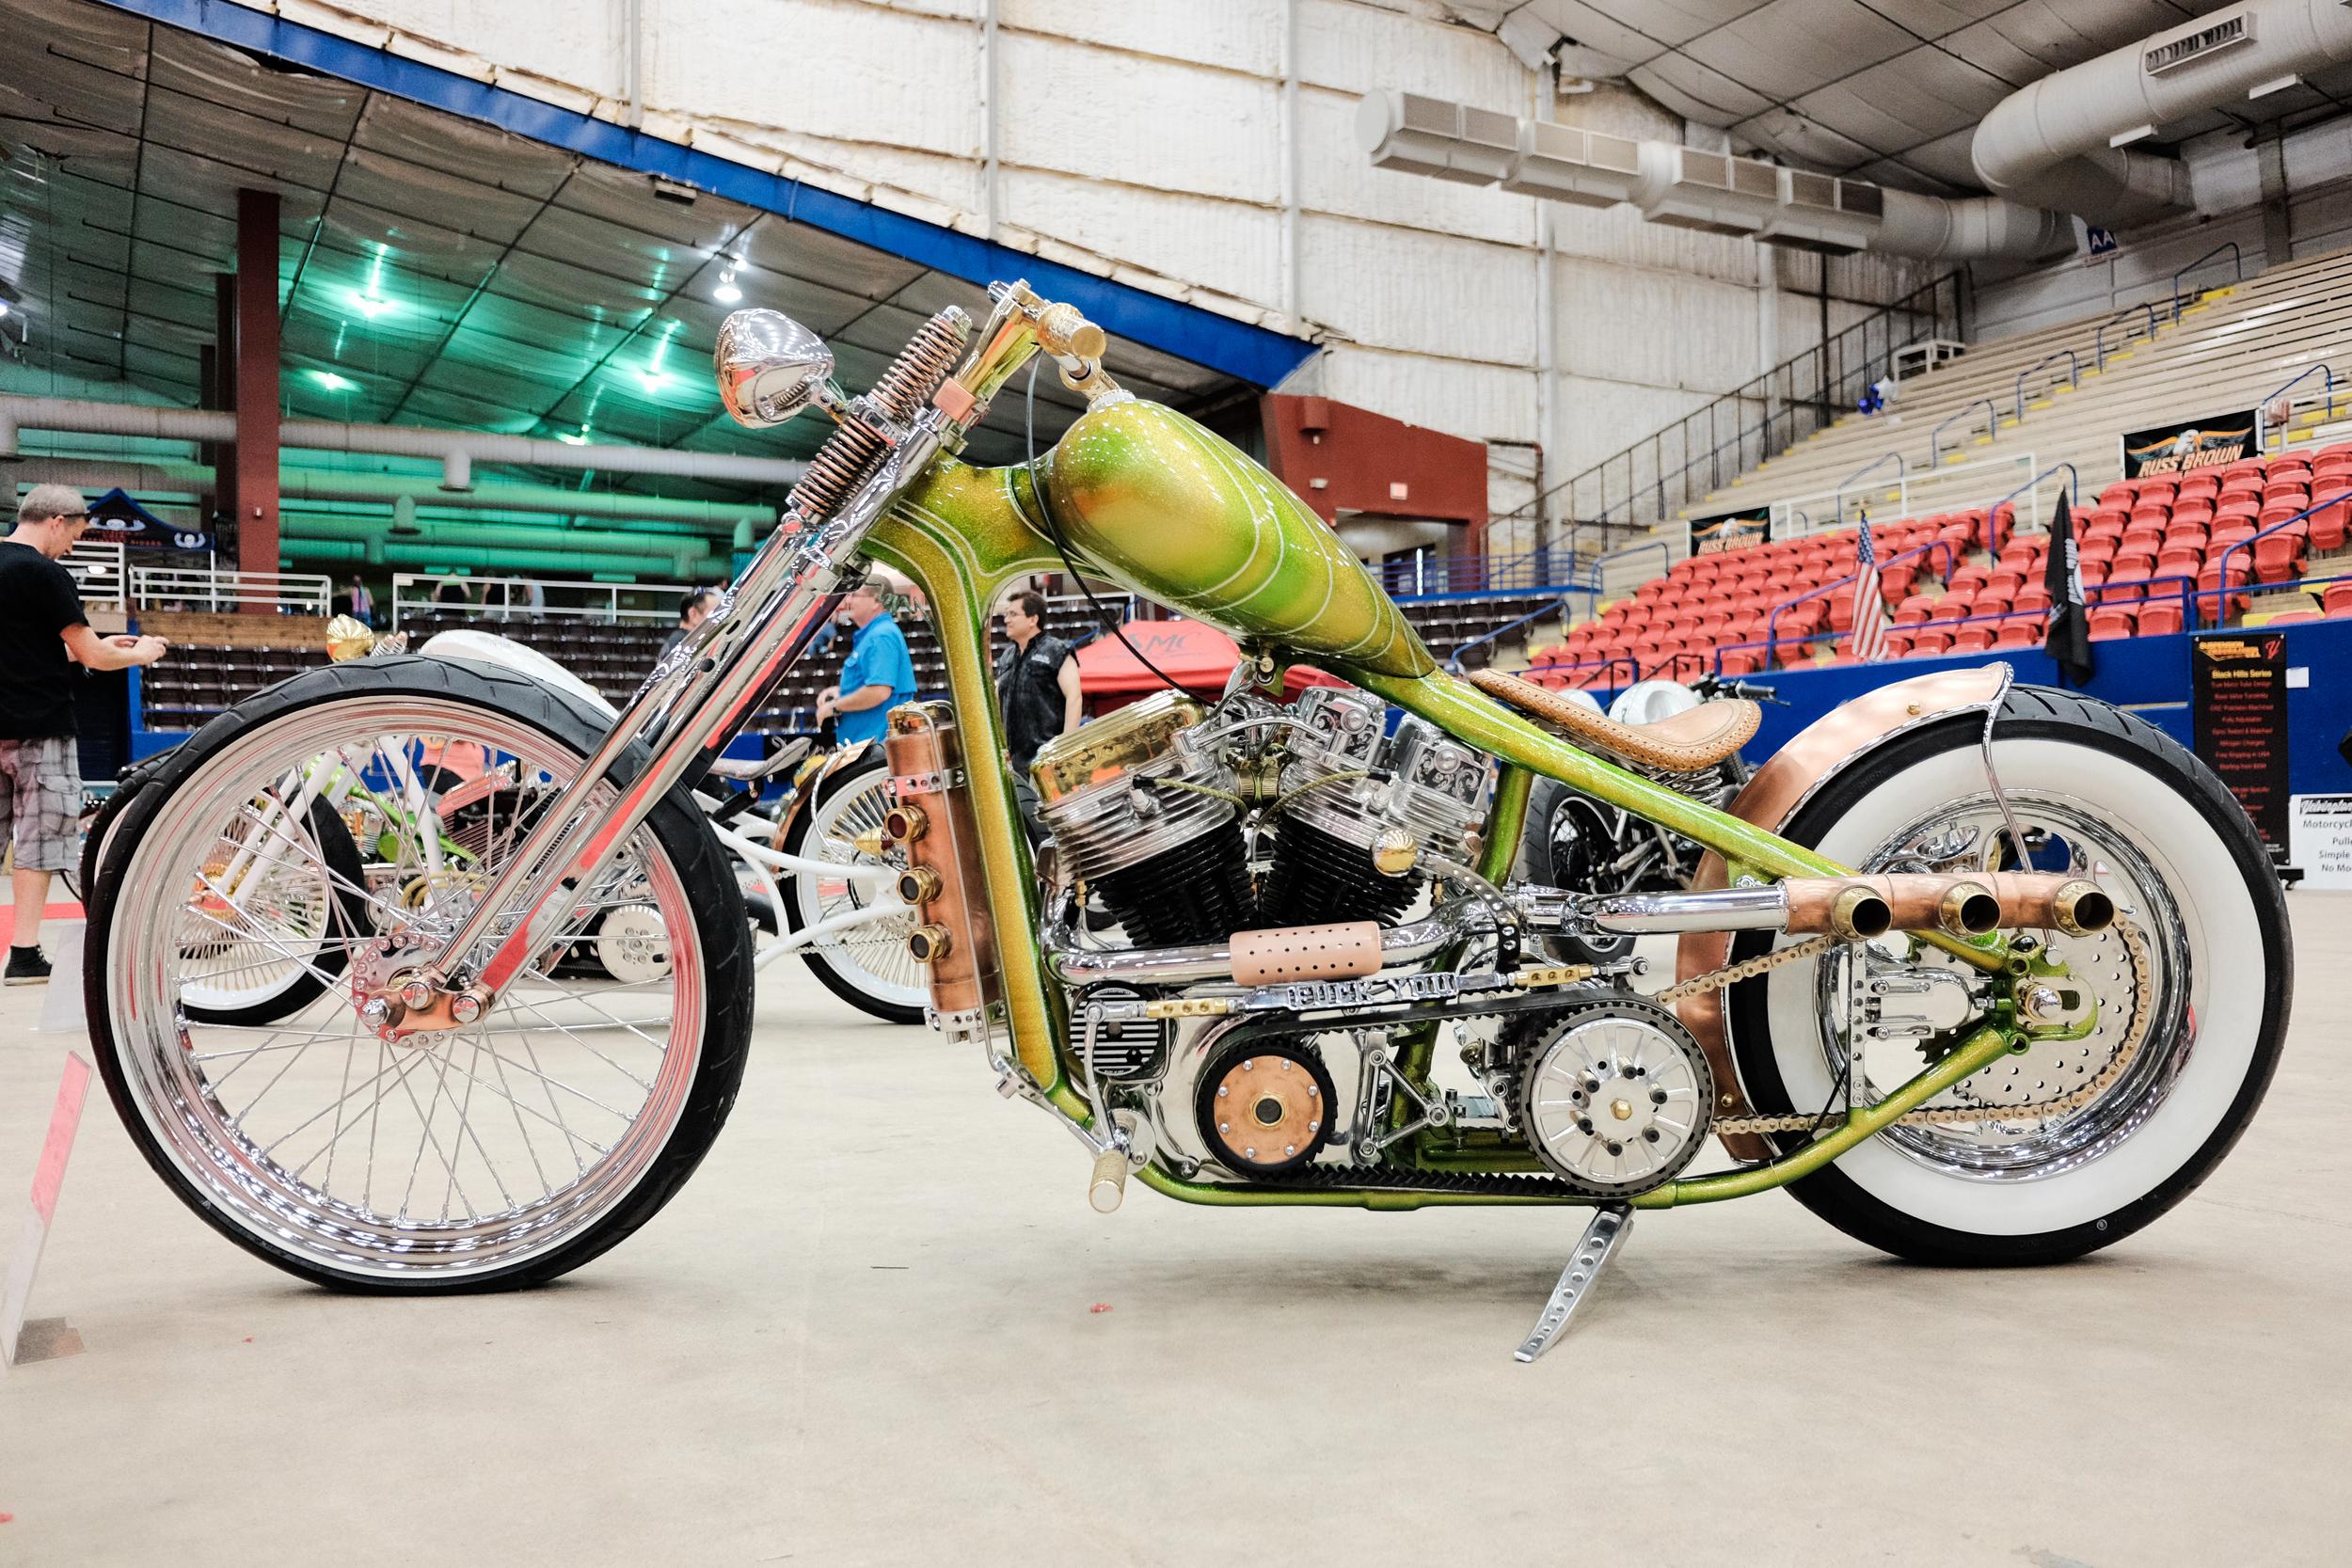 rot-rally-custom-bike-show-2016-0137.jpg